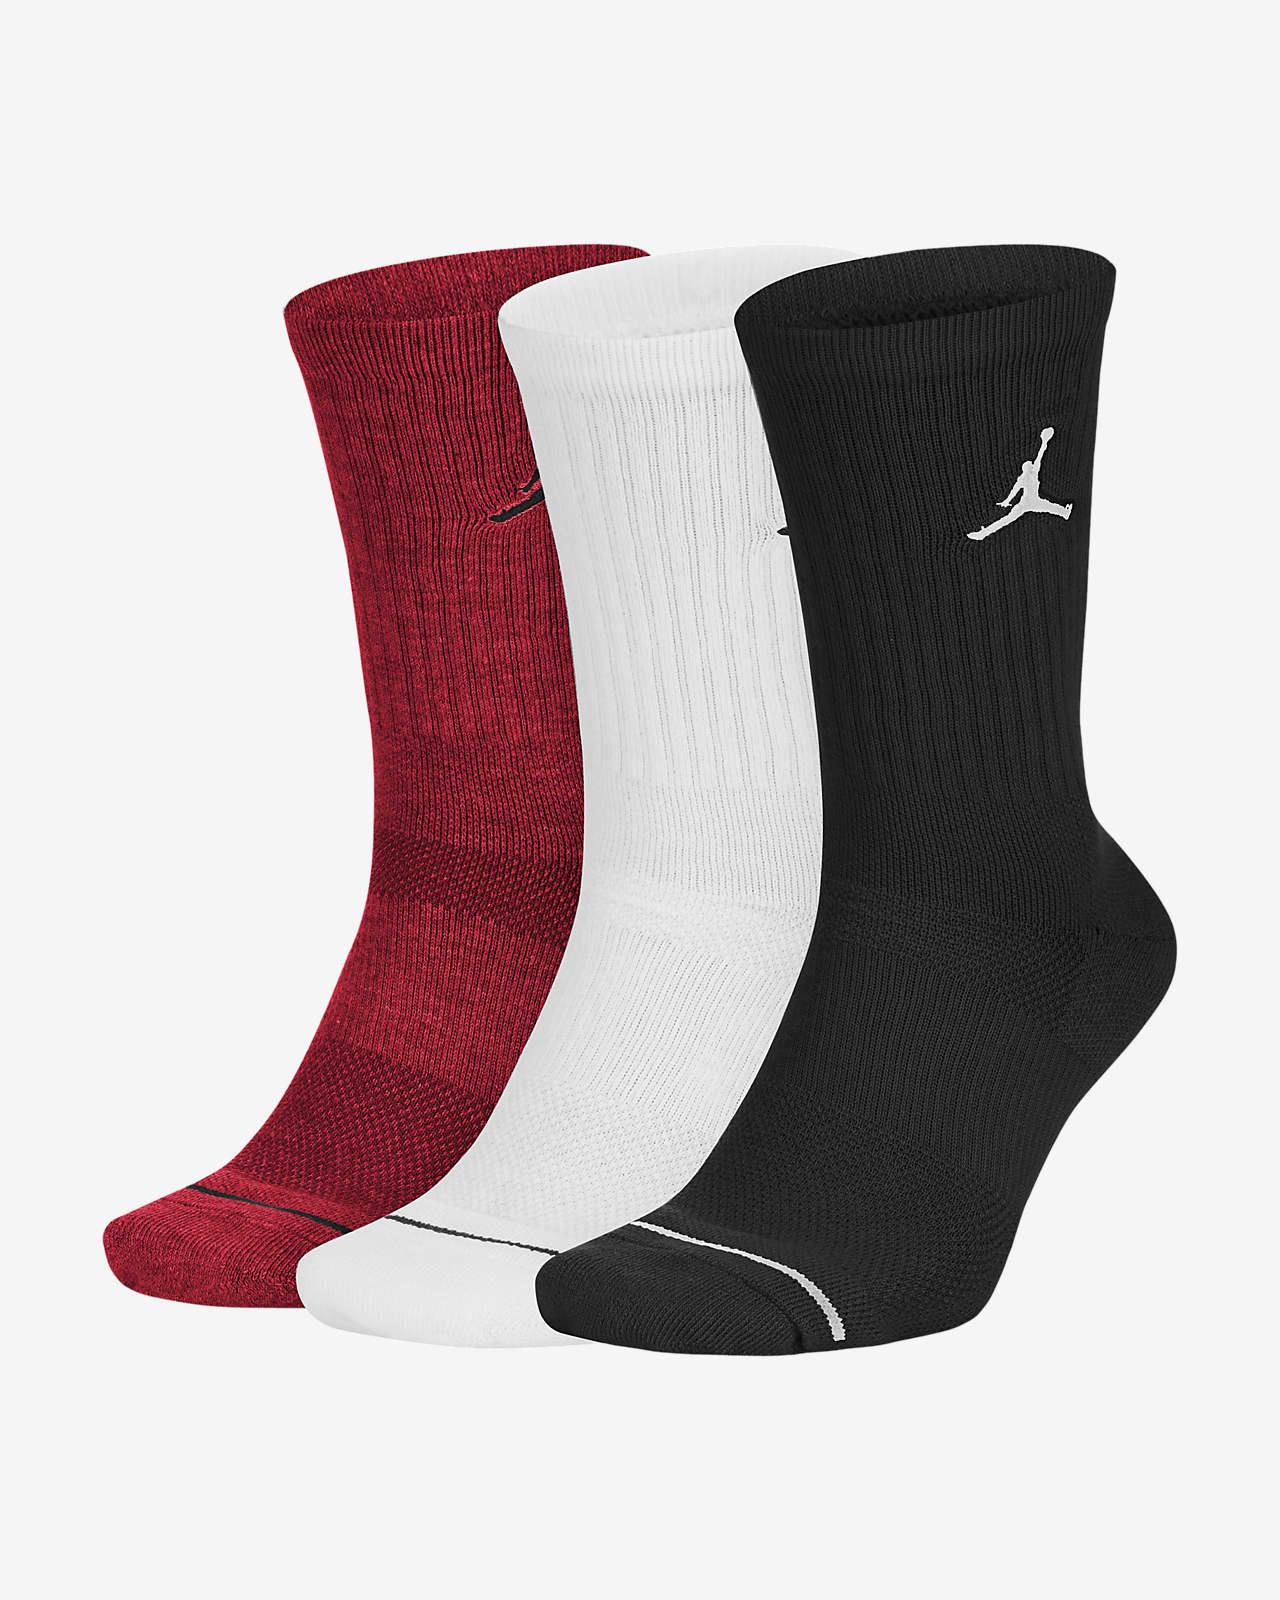 Jordan Everyday Max Unisex Crew Socks (3 Pack)